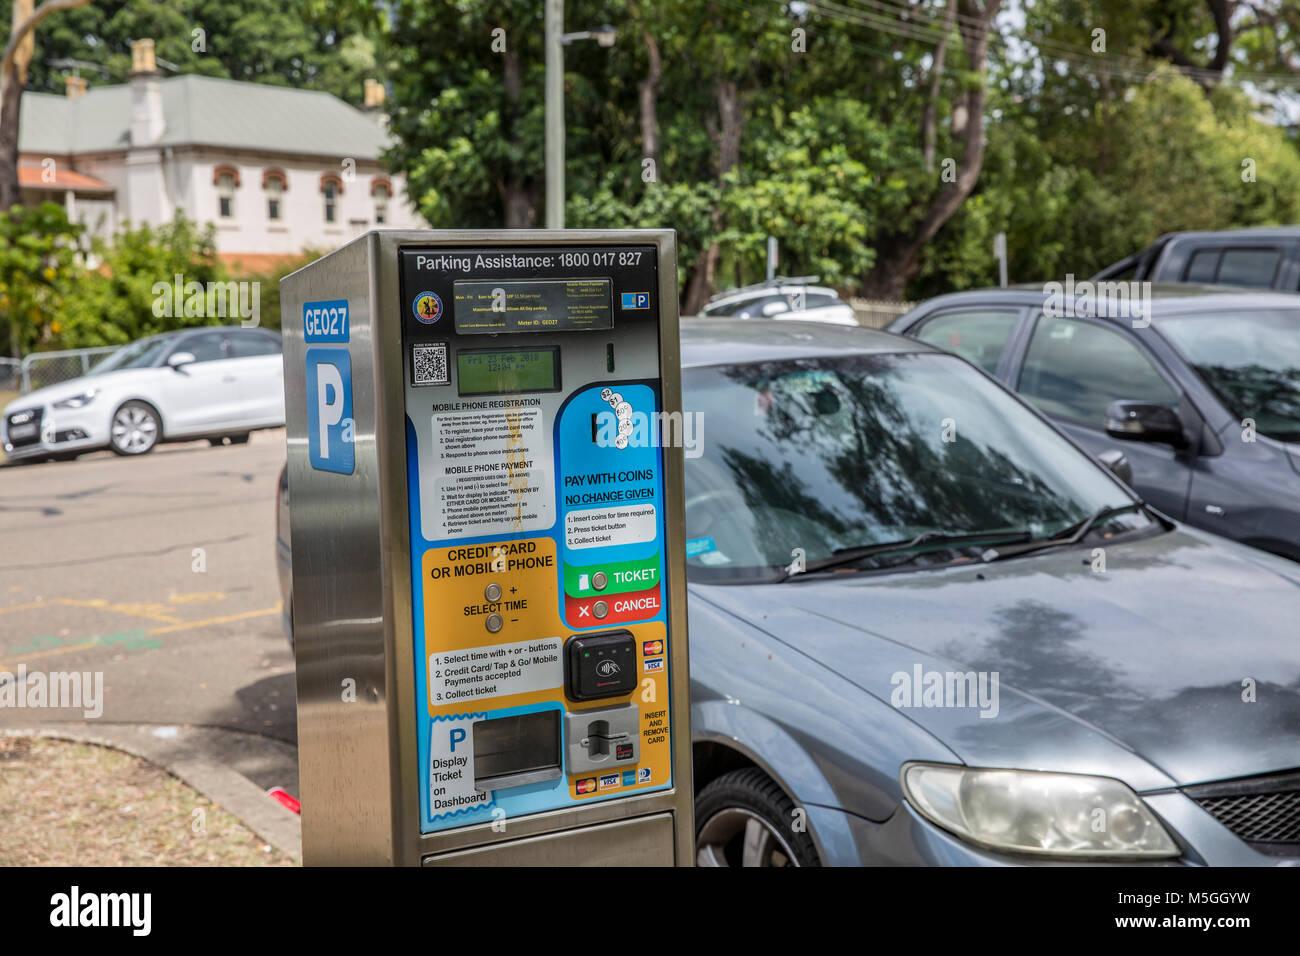 Council car parking meter in Sydney,Australia - Stock Image